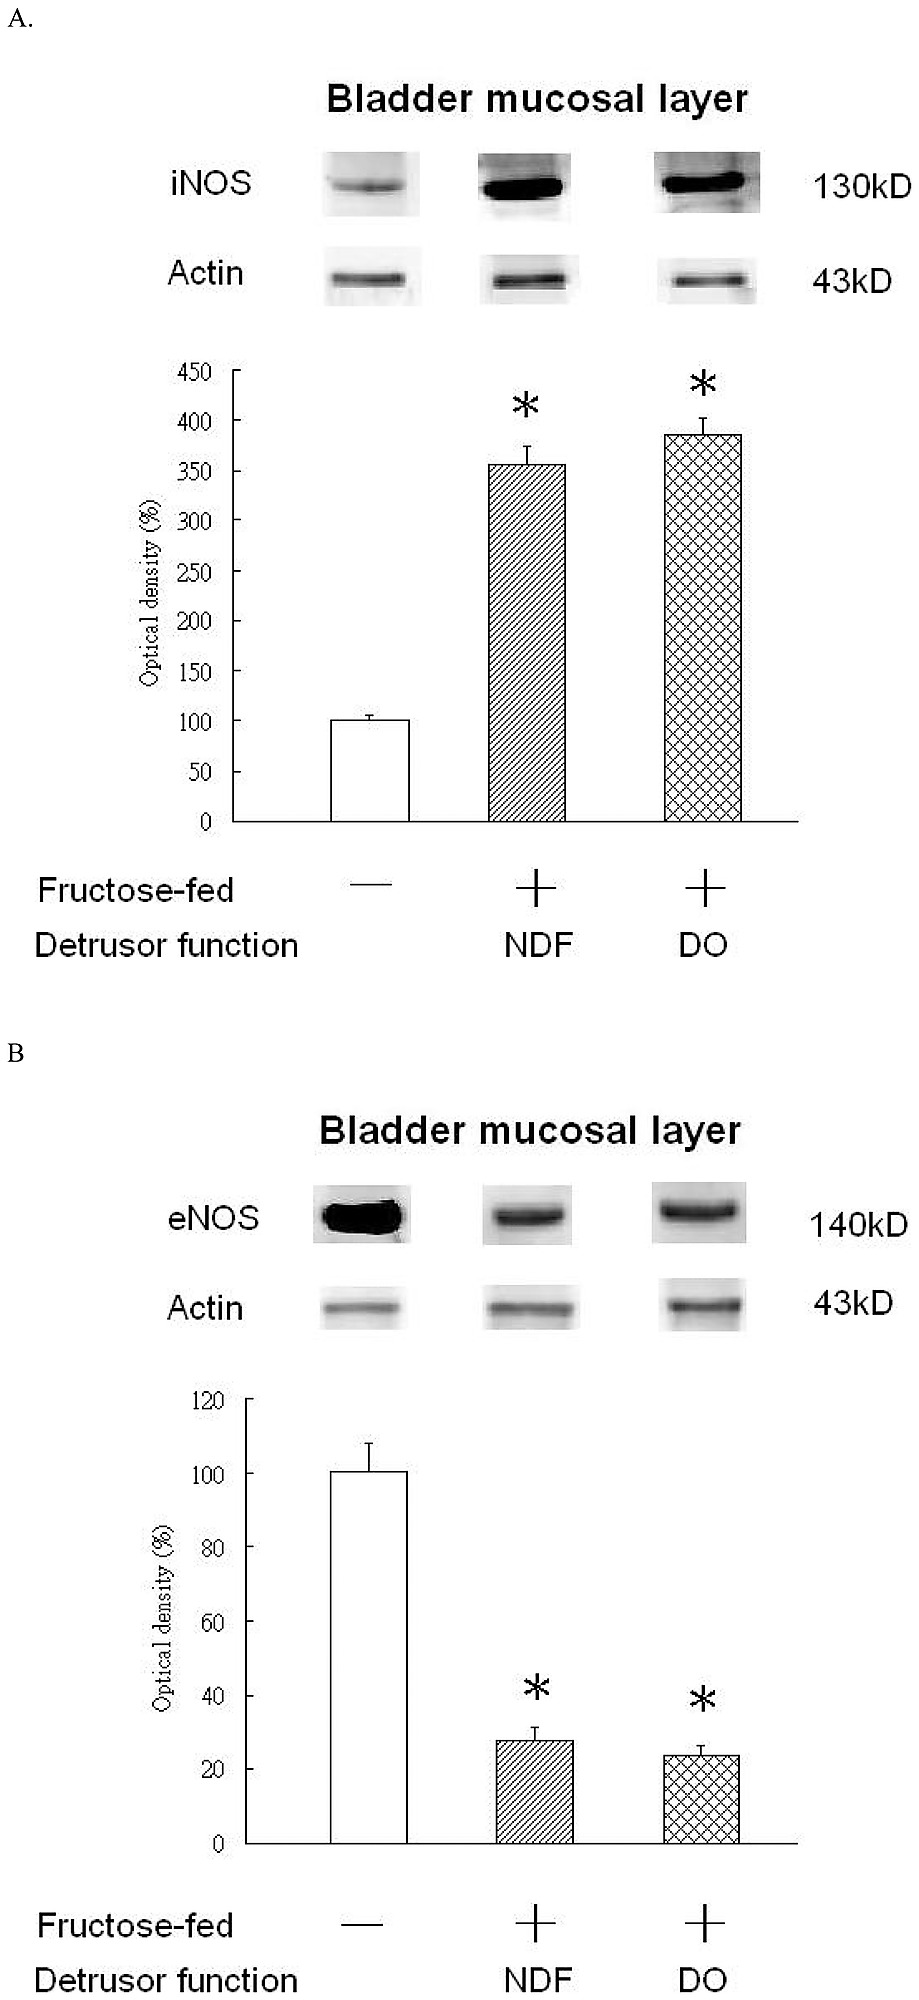 hight resolution of bladder mucosa diagram